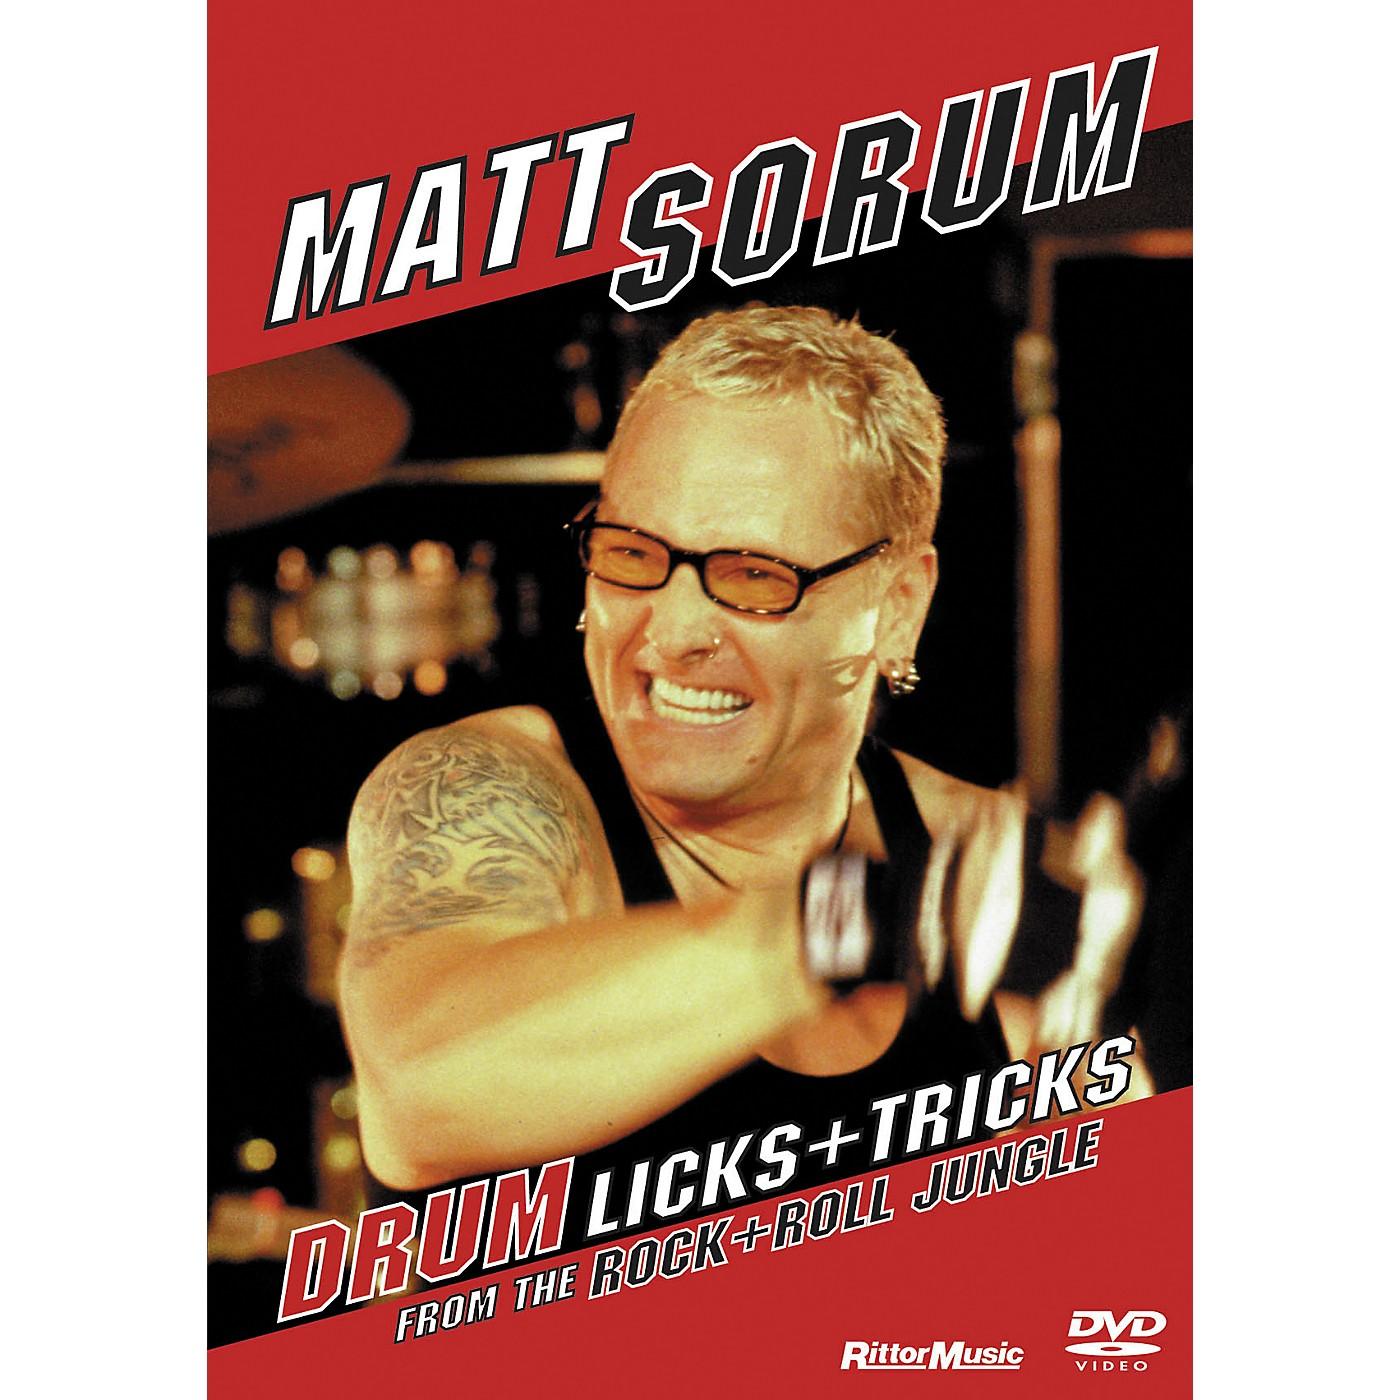 Rittor Music Matt Sorum - Drum Licks + Tricks From The Rock + Roll Jungle (DVD) thumbnail